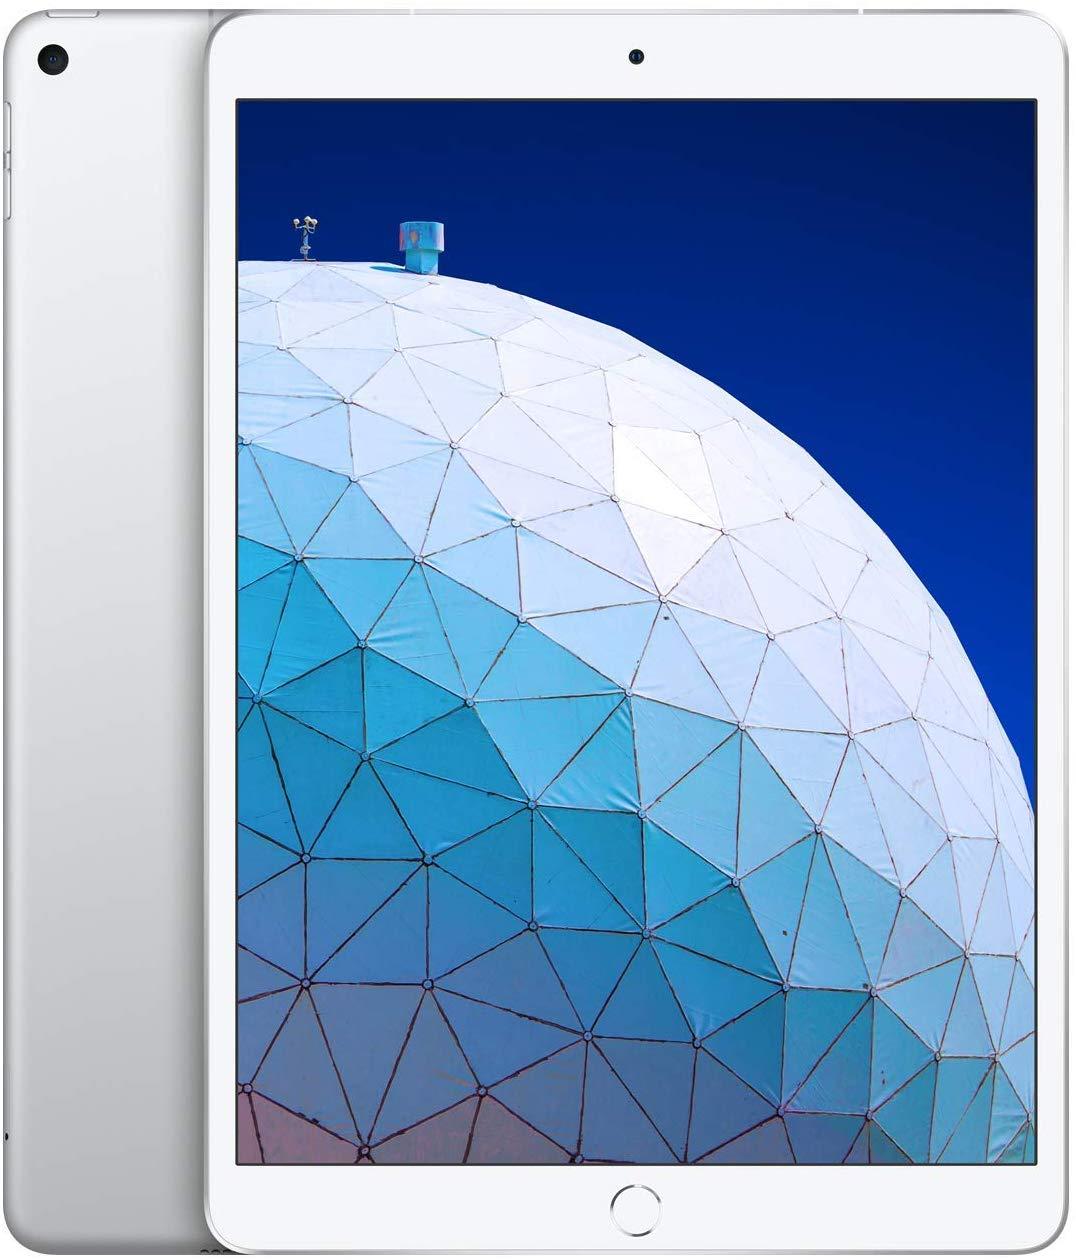 Apple iPad Air 10.5″ Wi-Fi + Cellular 64GB (Silver) voor €549,28